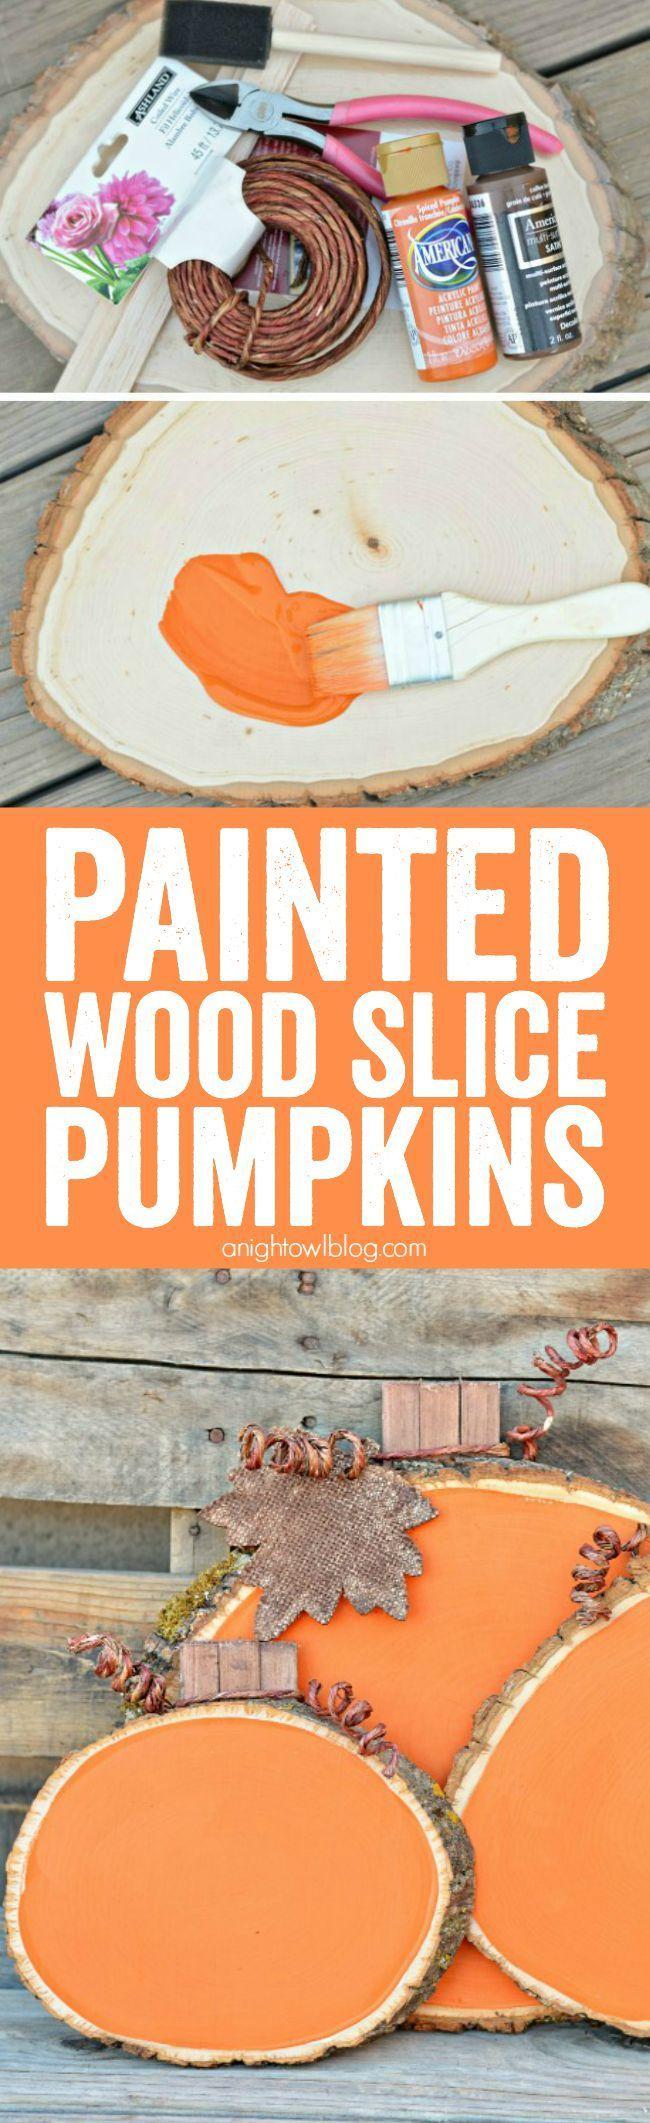 Painted Wood Slice Pumpkins #diyfalldecor